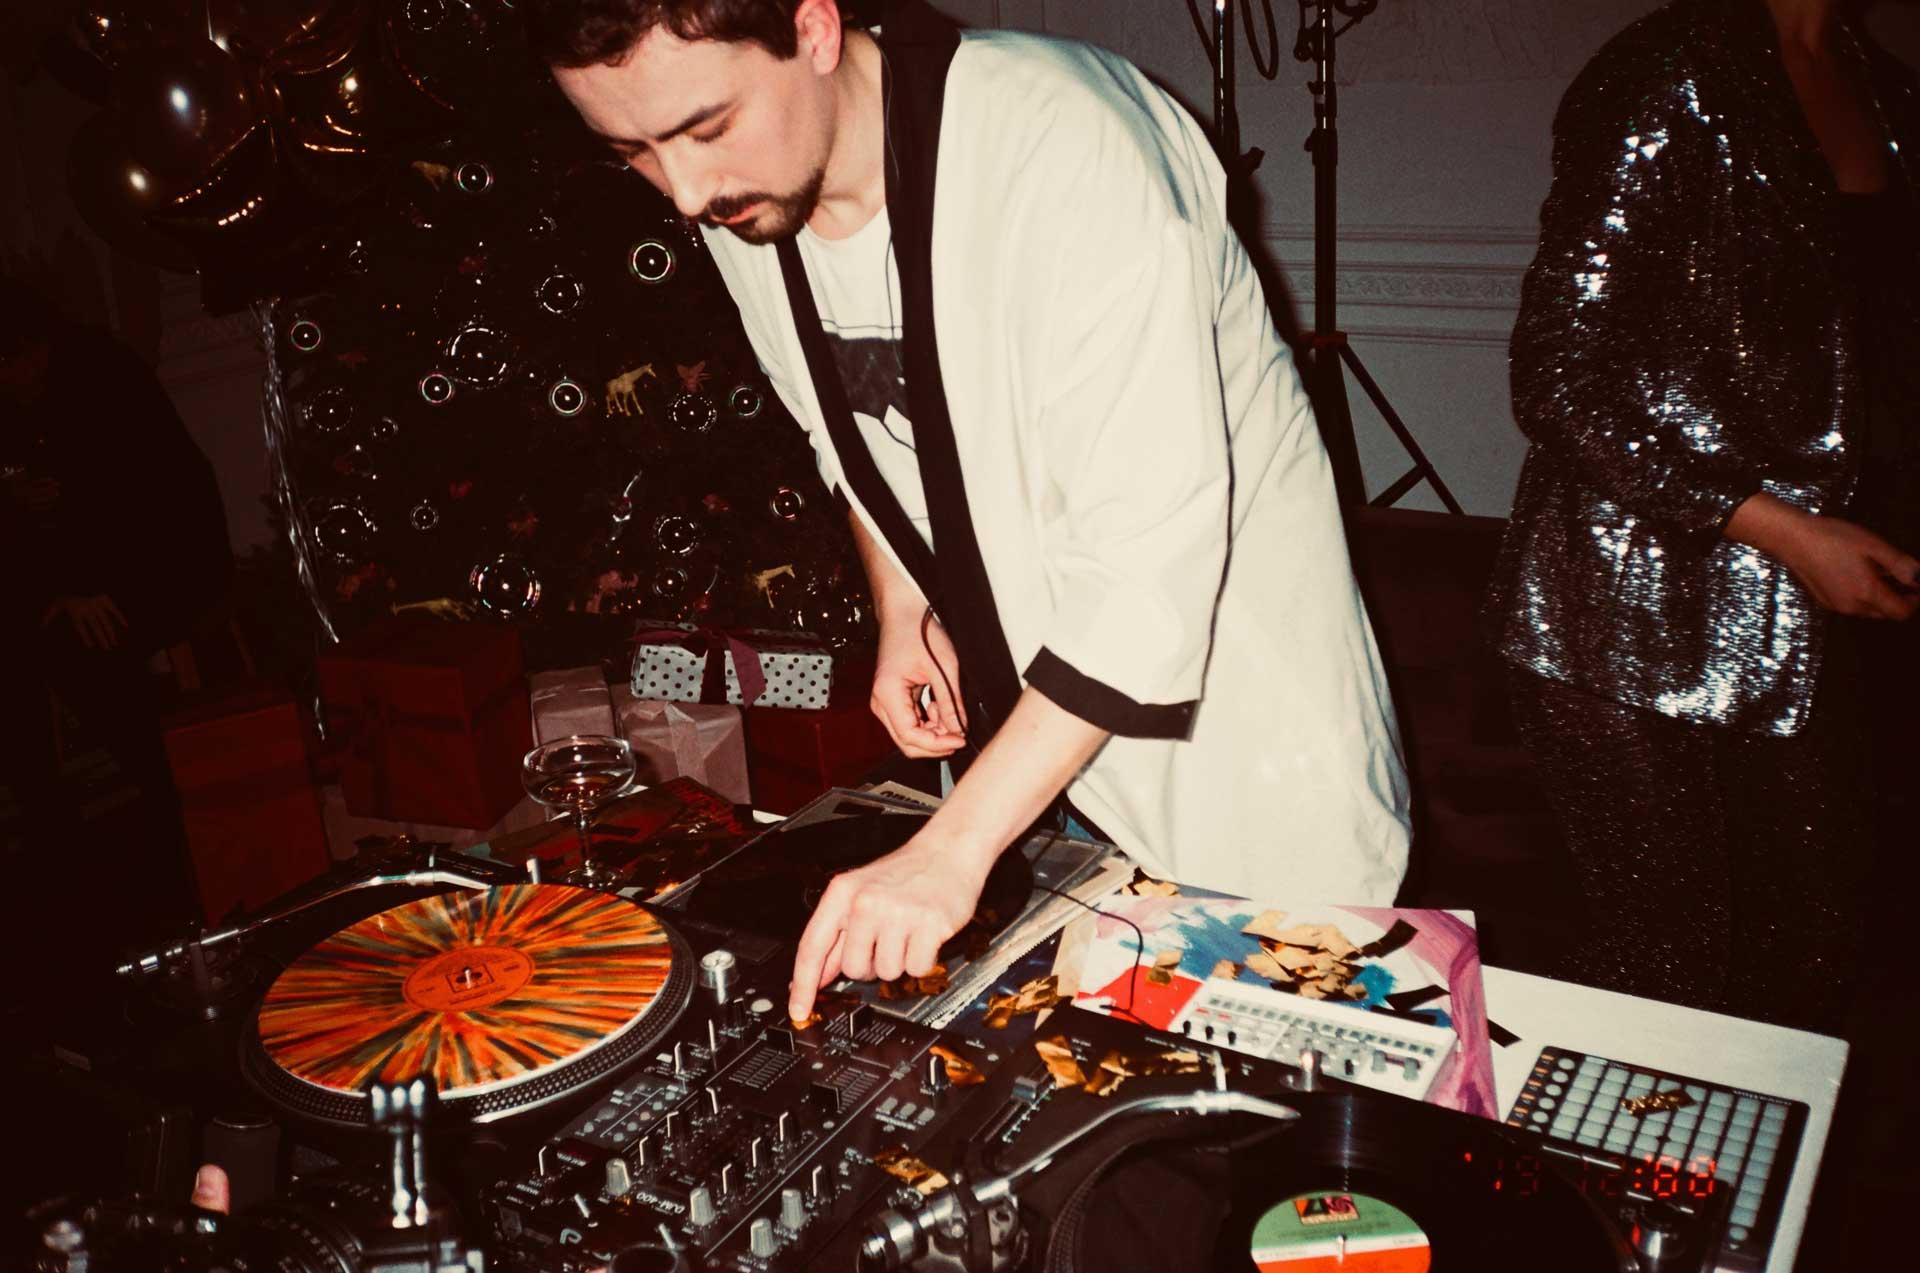 ryan playing at 18th birthday party in toorak brighton